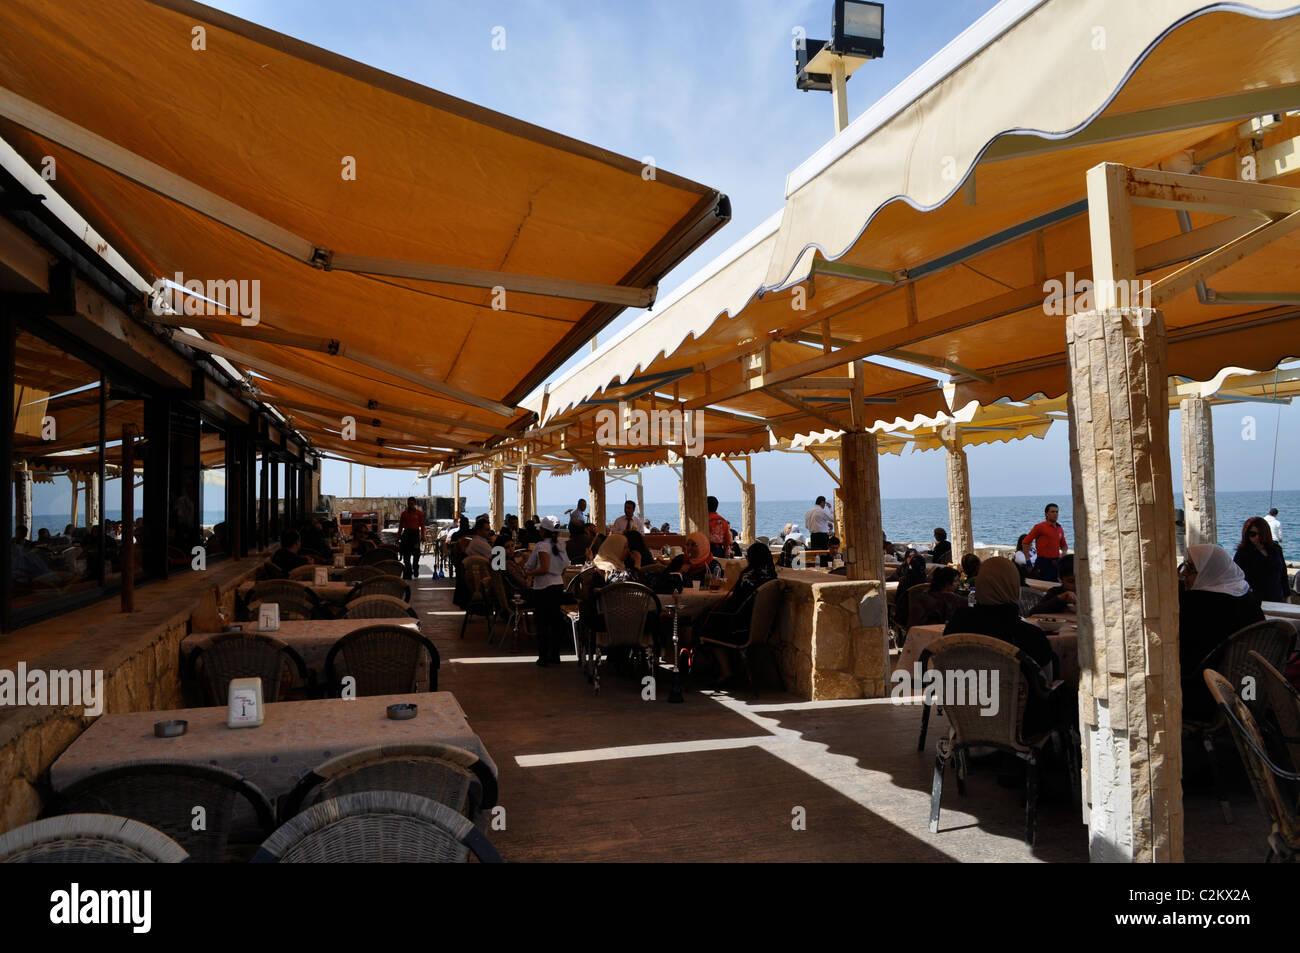 Al Manara, Beirut, Lebanon. Mediterranean cafe, Muslim families. Unlicensed cafes and restaurants on the Mediterranean. - Stock Image